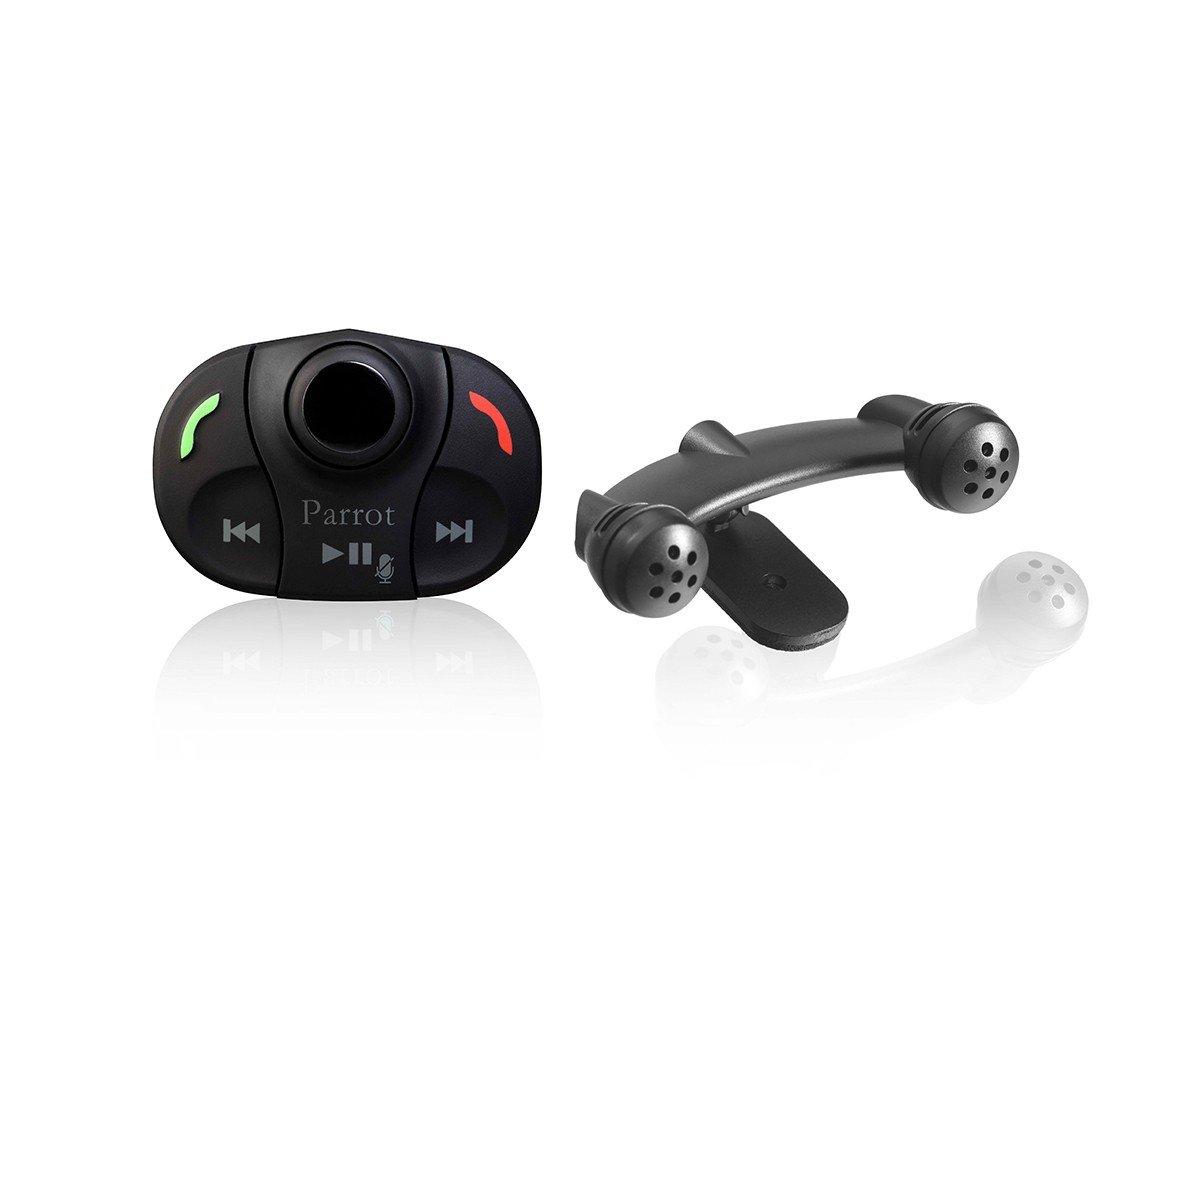 Parrot MKi9100 - Manos libres Bluetooth para mó vil (importado) Parrot MKi9100 - Manos libres Bluetooth para móvil (importado)